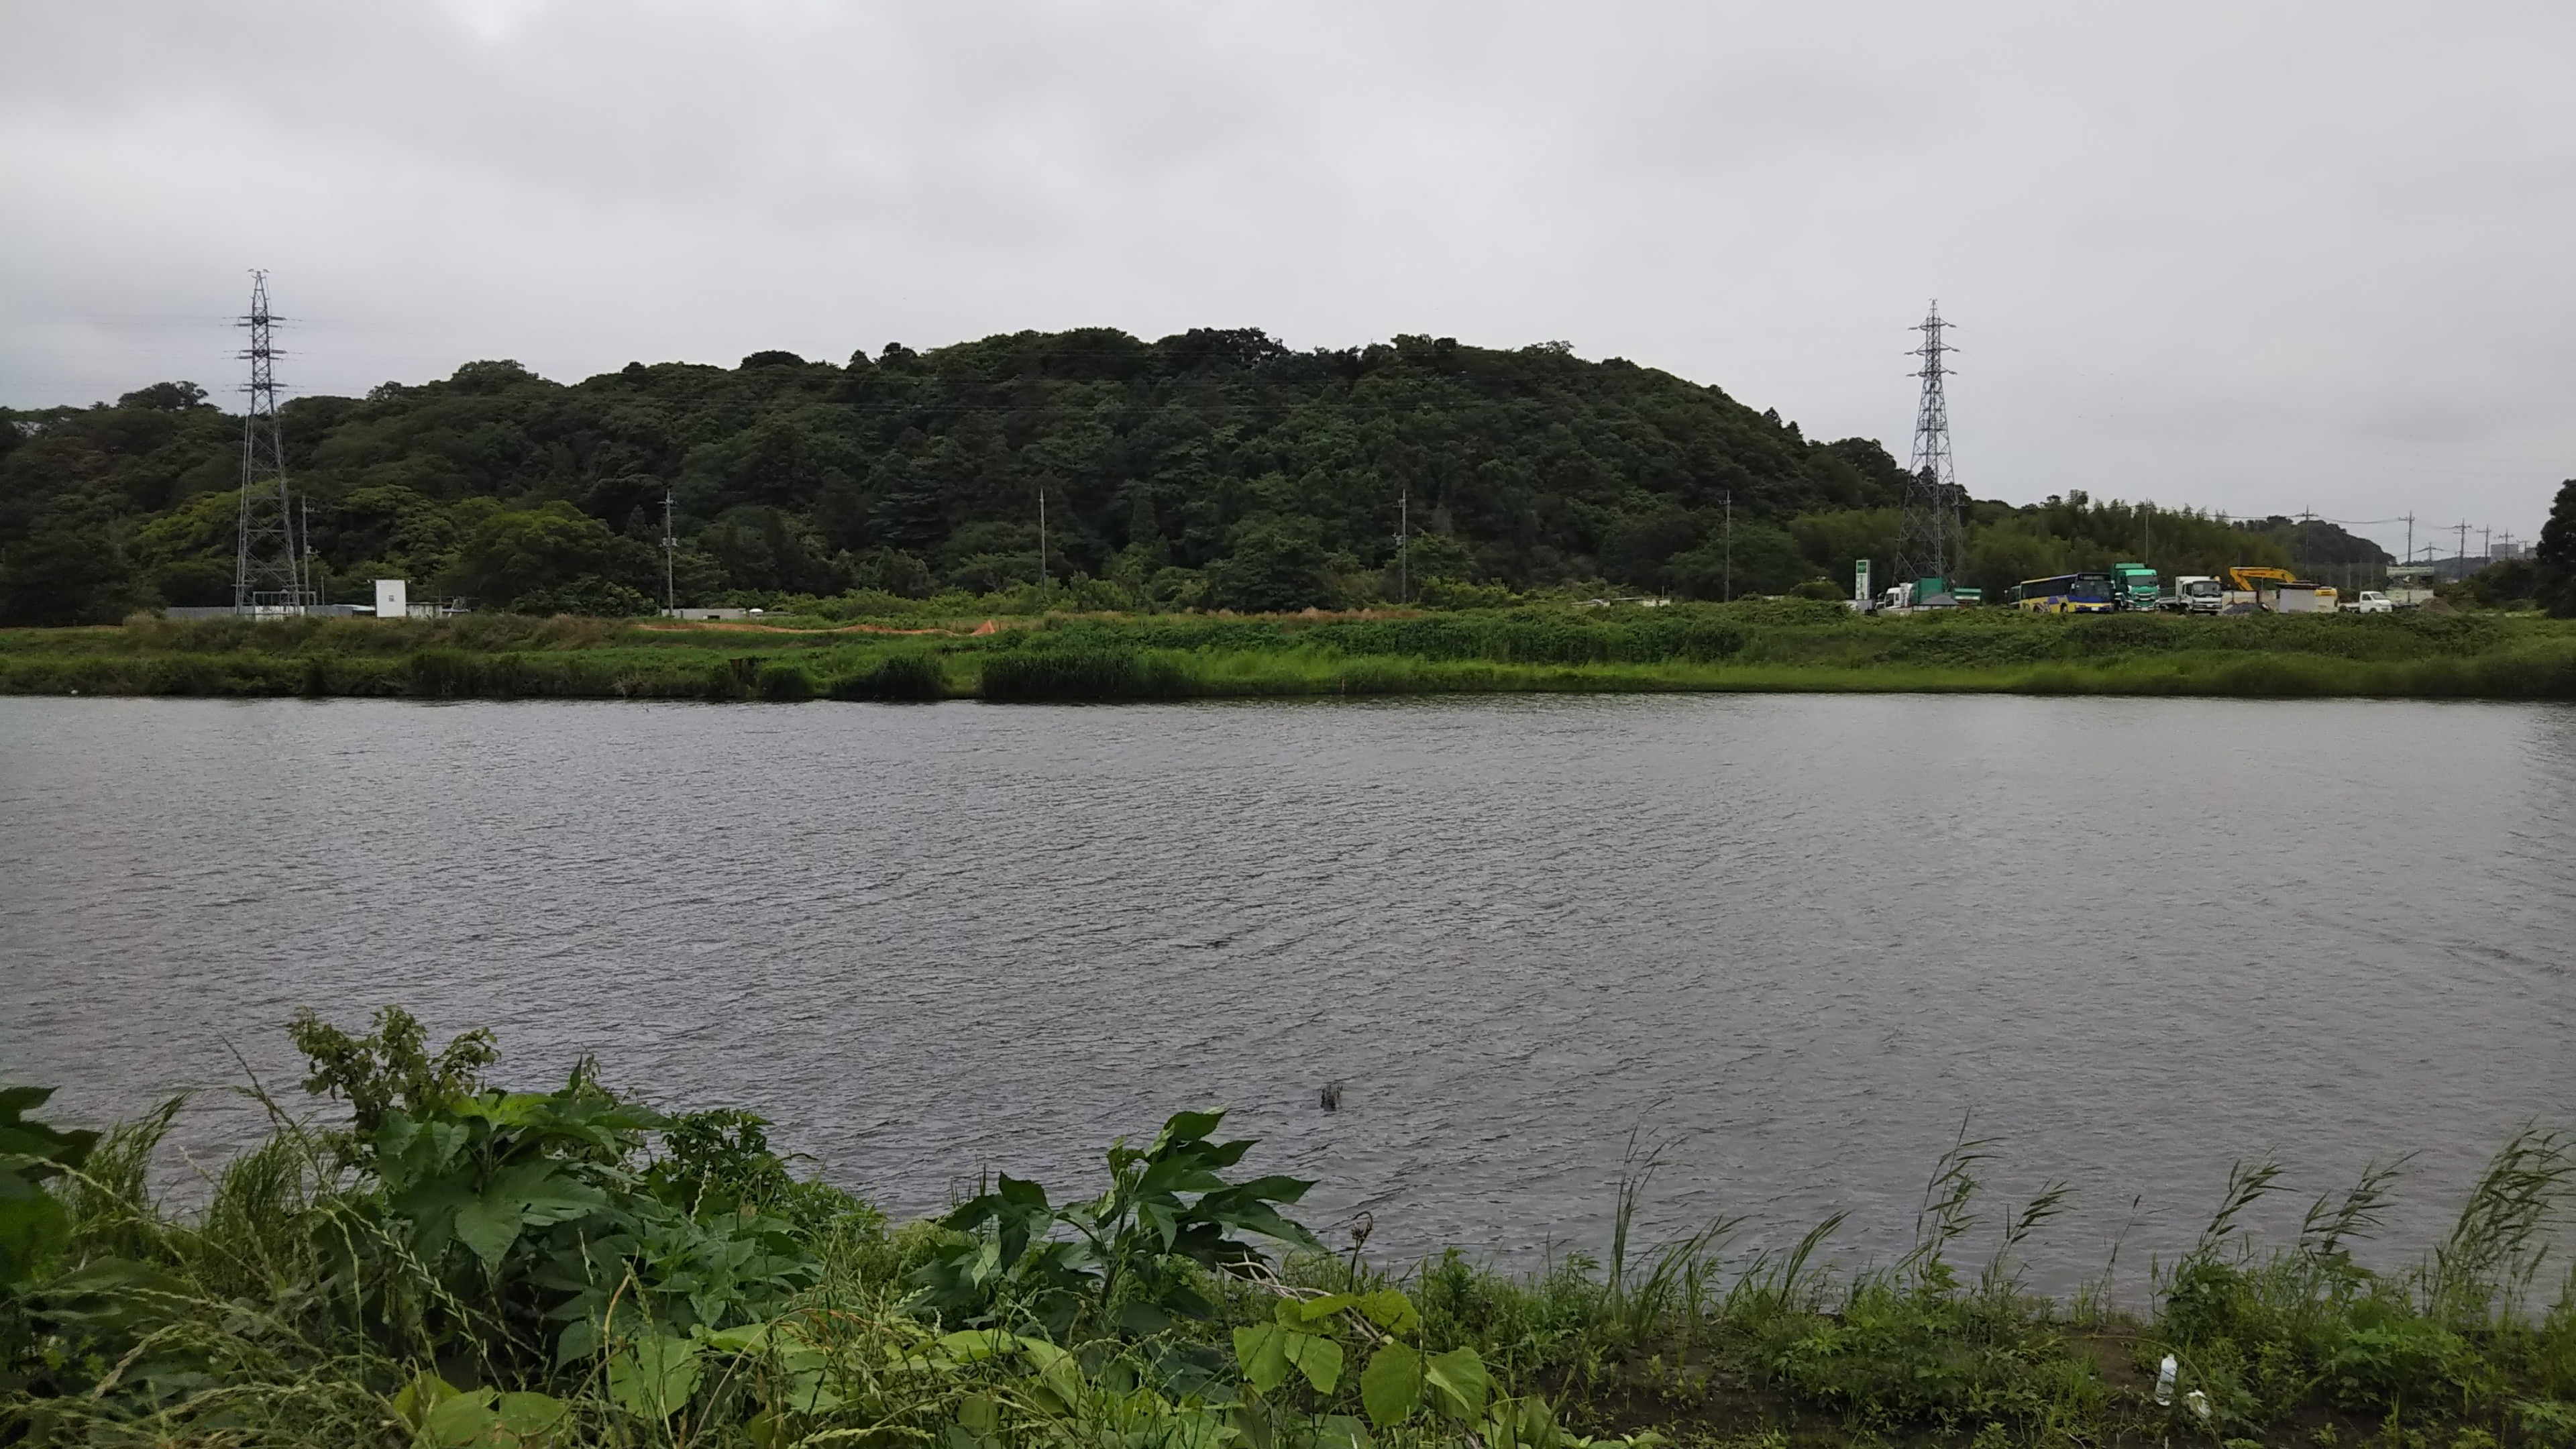 f:id:nomzakki:20190610200245j:image